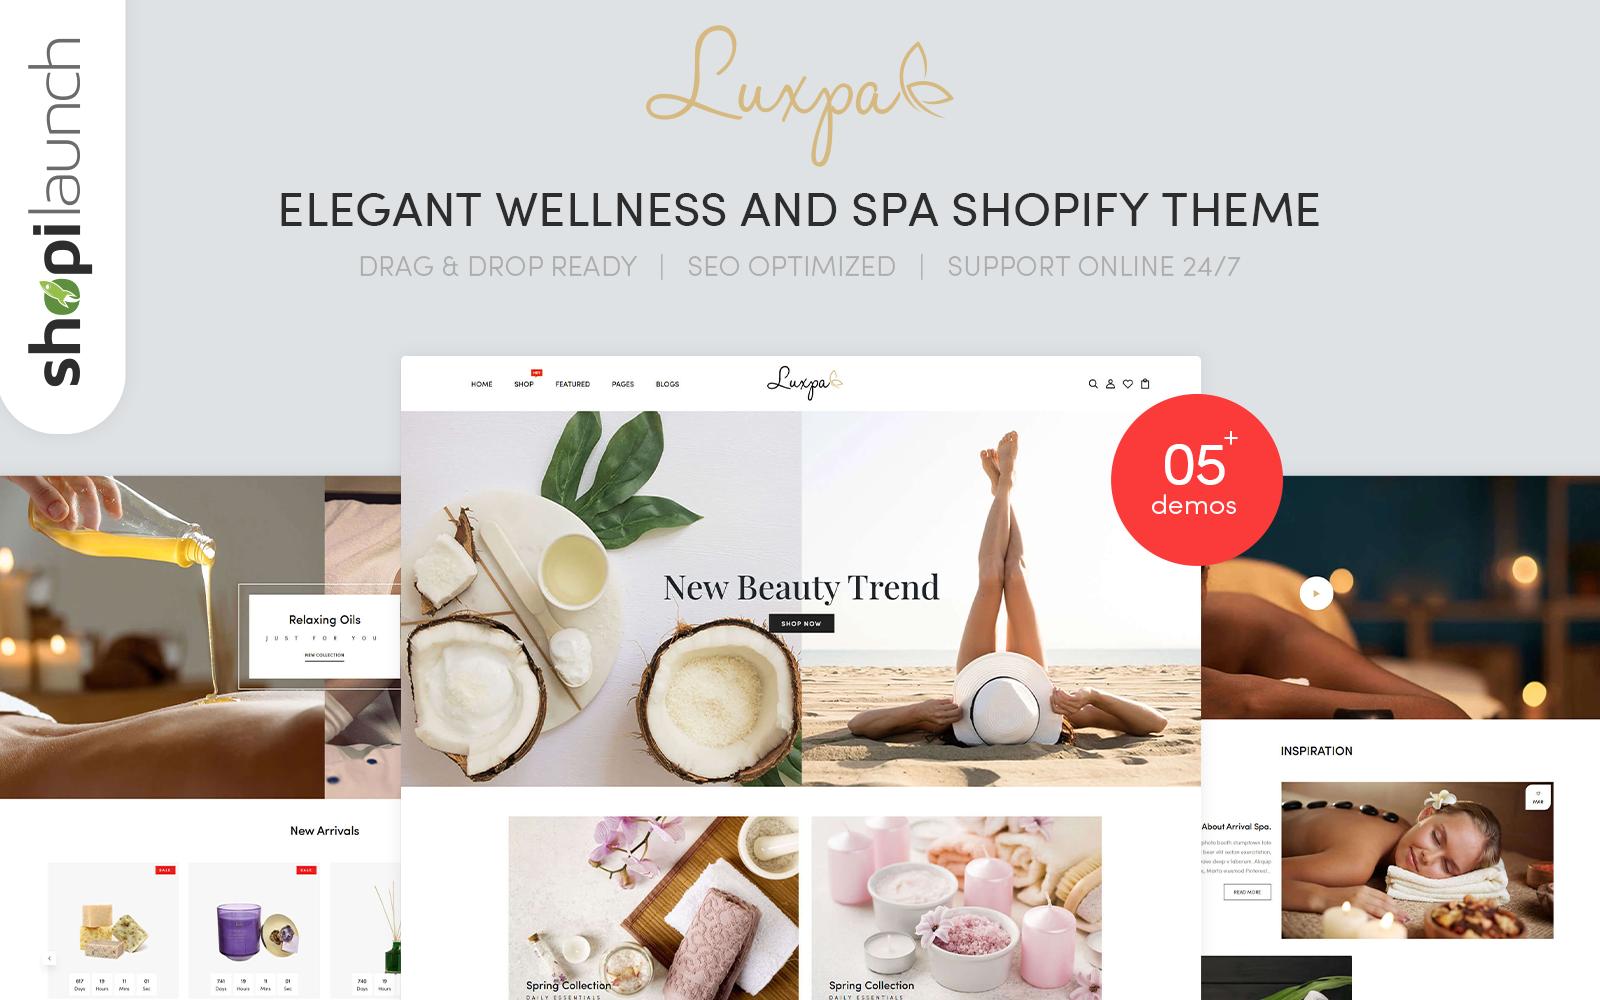 Reszponzív Luxpa - Elegant Wellness & Spa Shopify sablon 126243